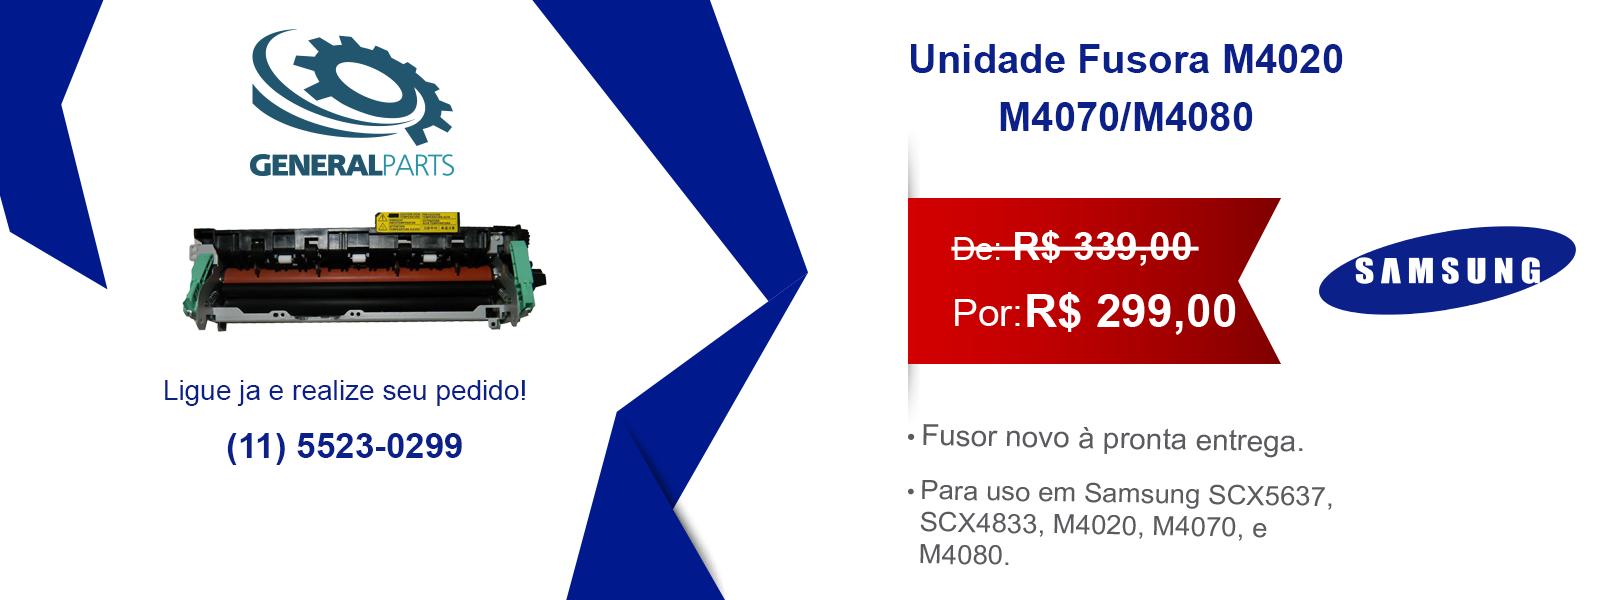 Fusora M4020 Samsung